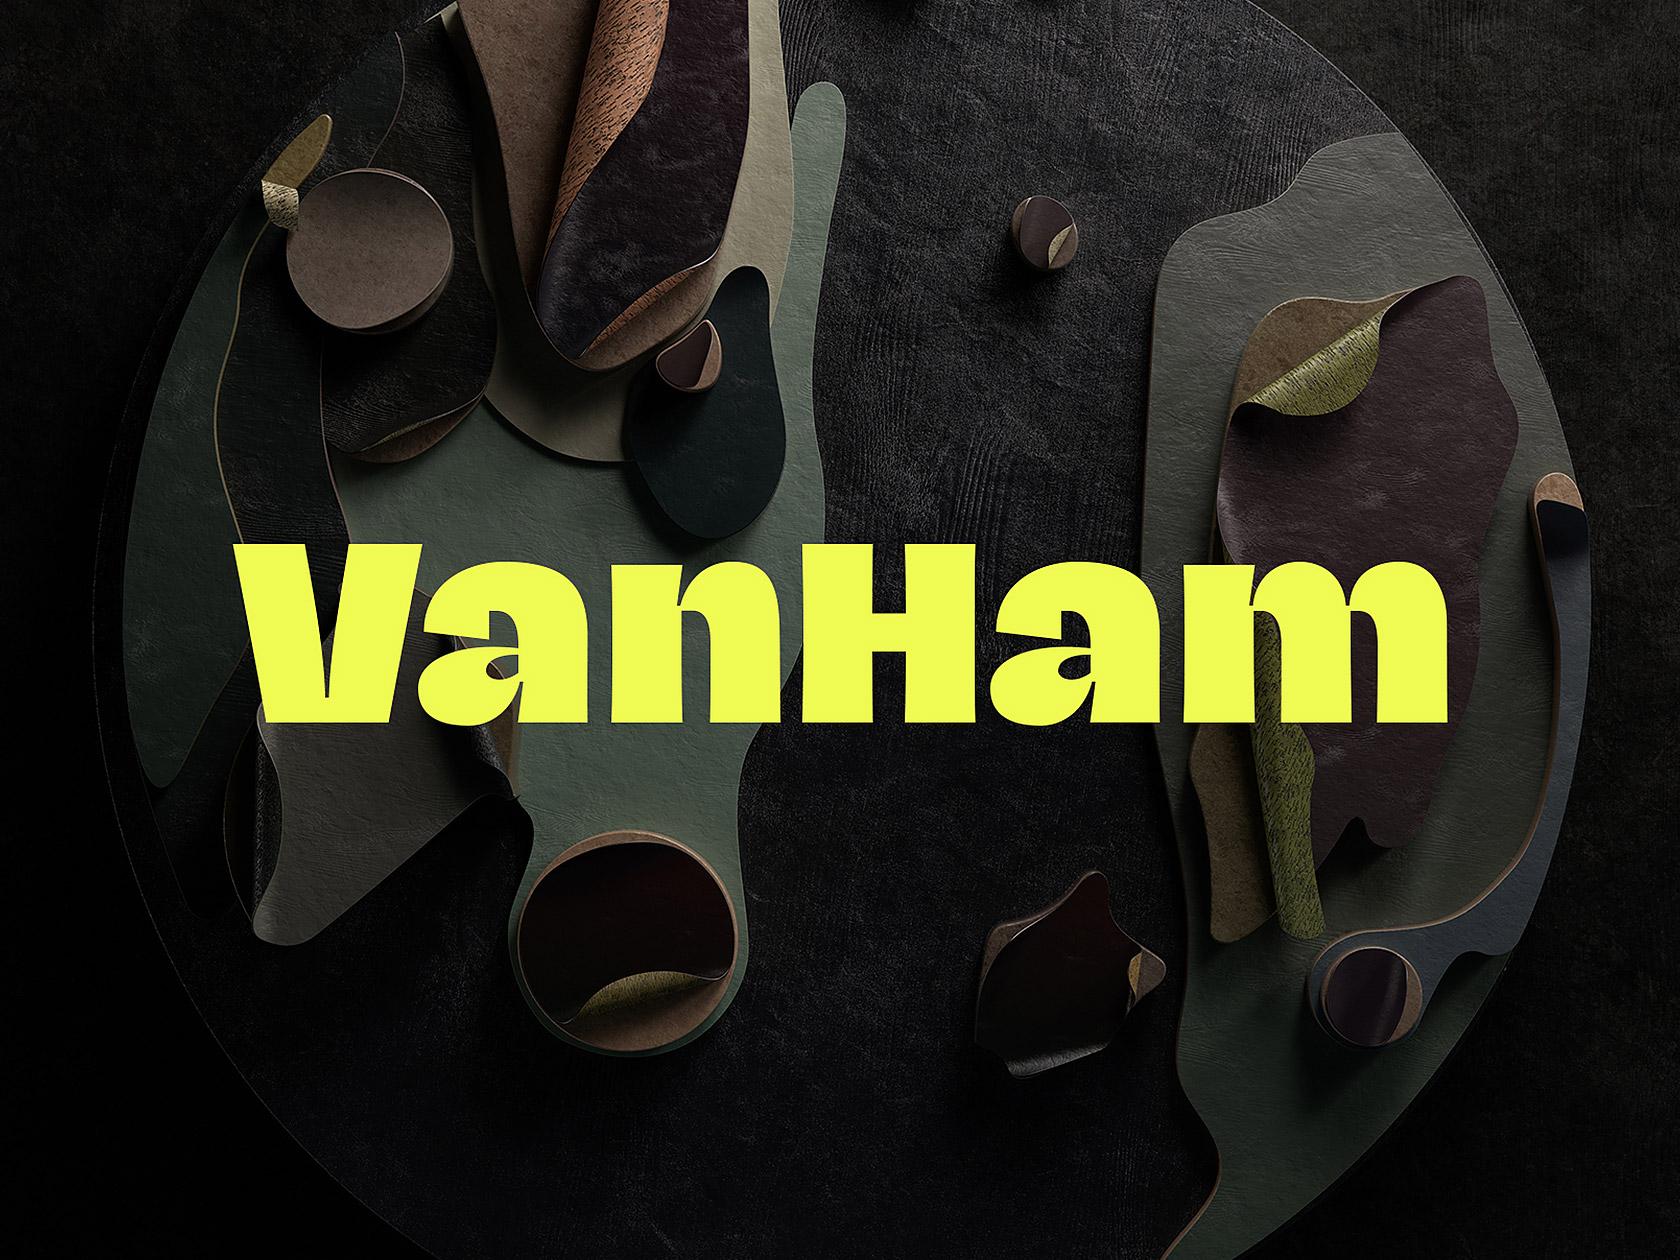 VanHam by Vitaly Grossmann, Dean Giffin, John Black